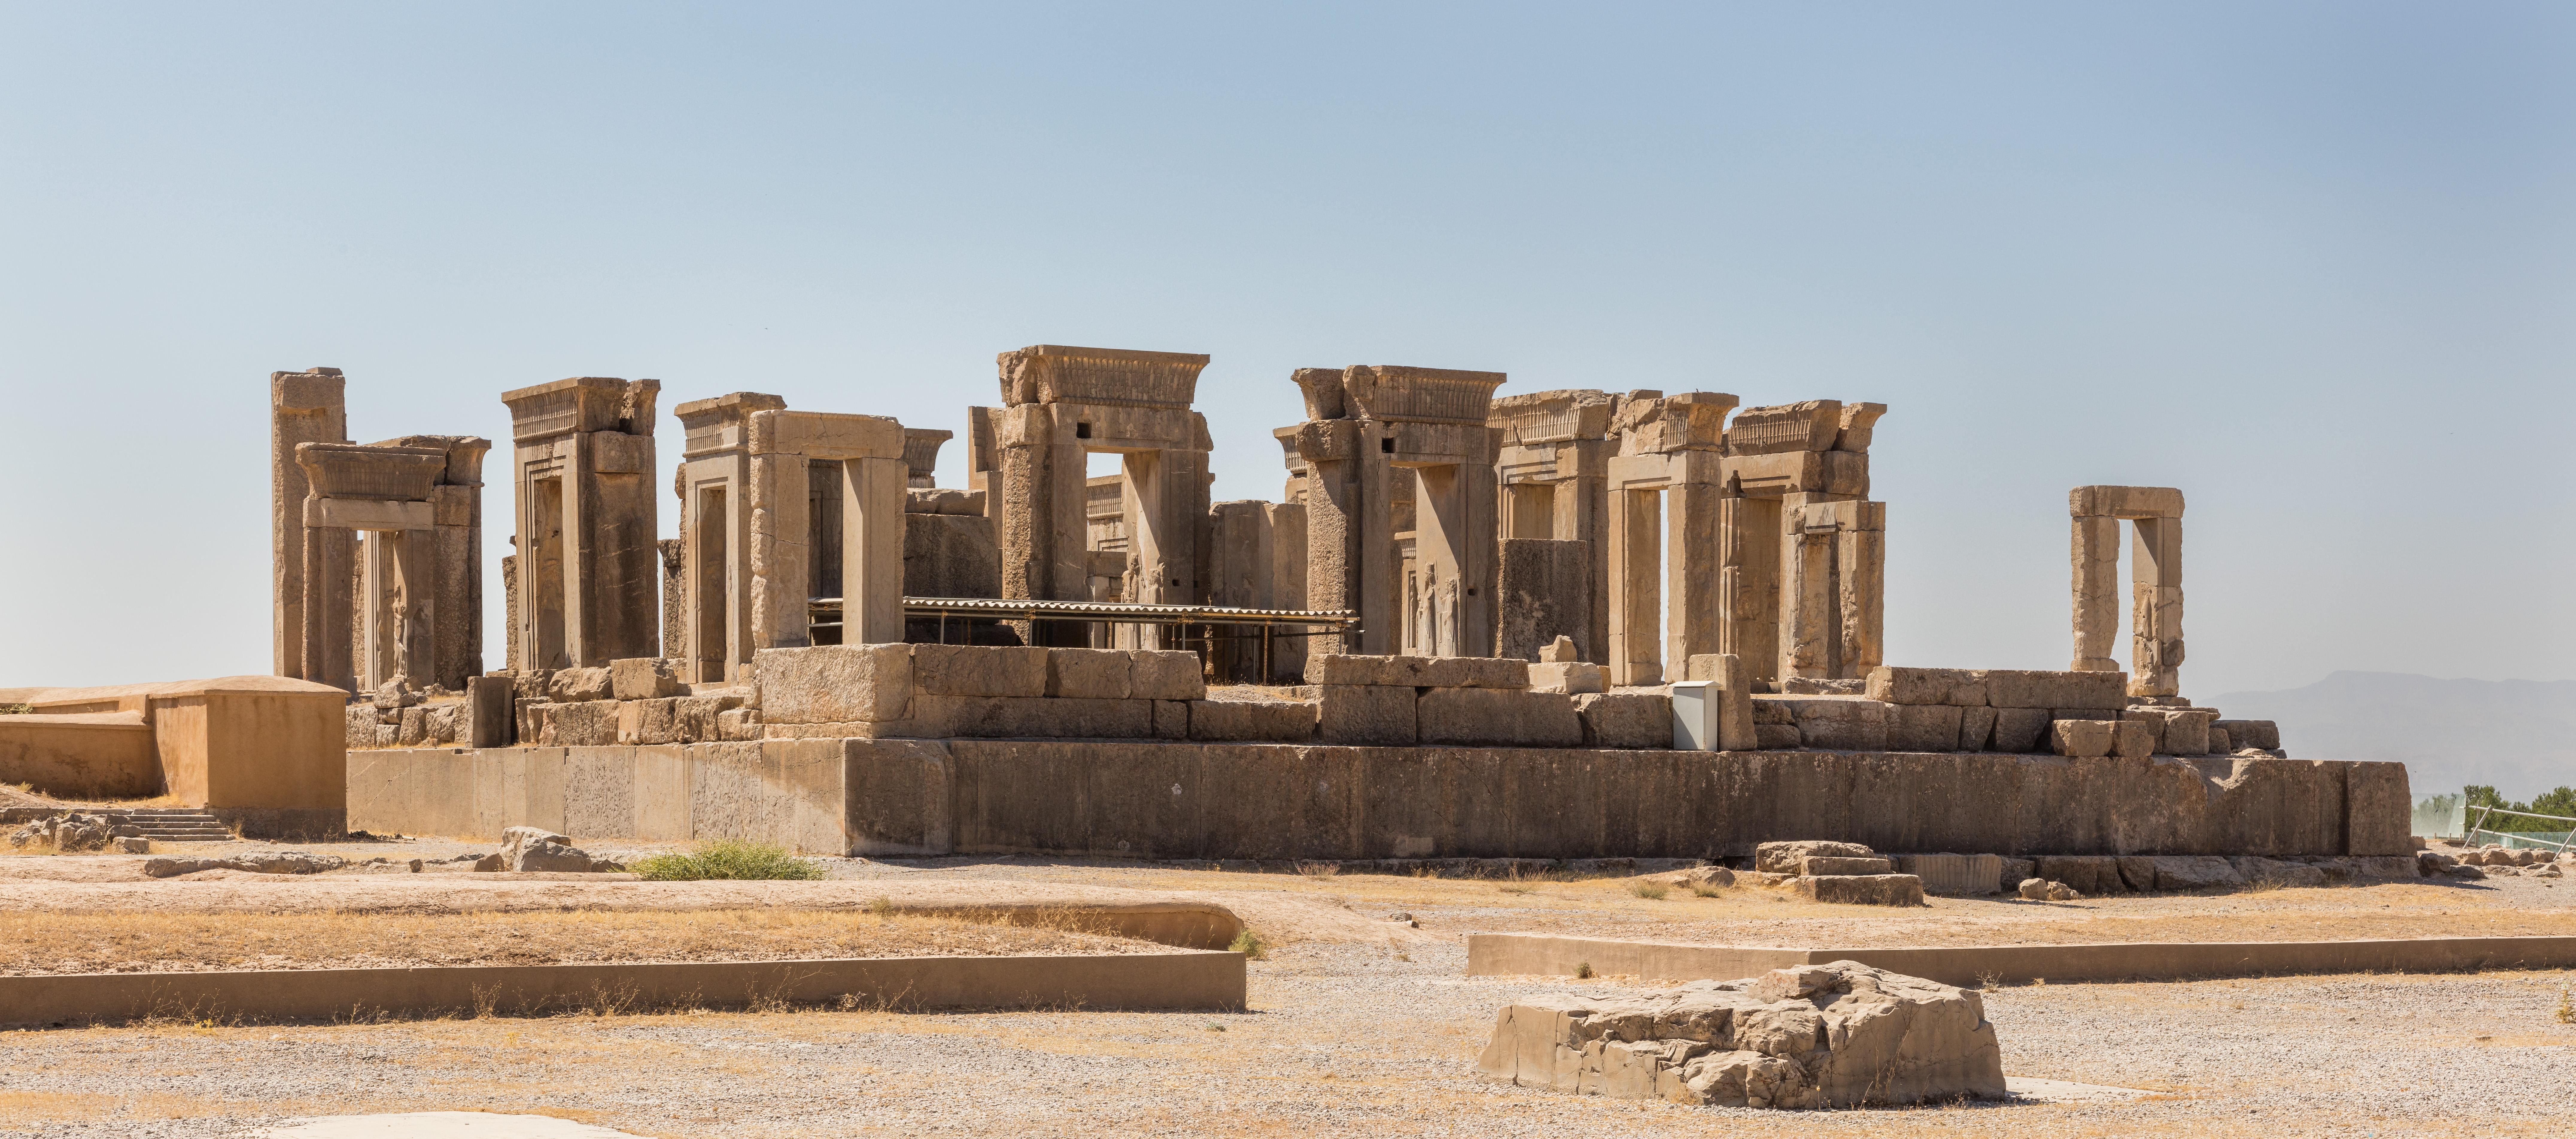 Achaemenid architecture - Wikipedia